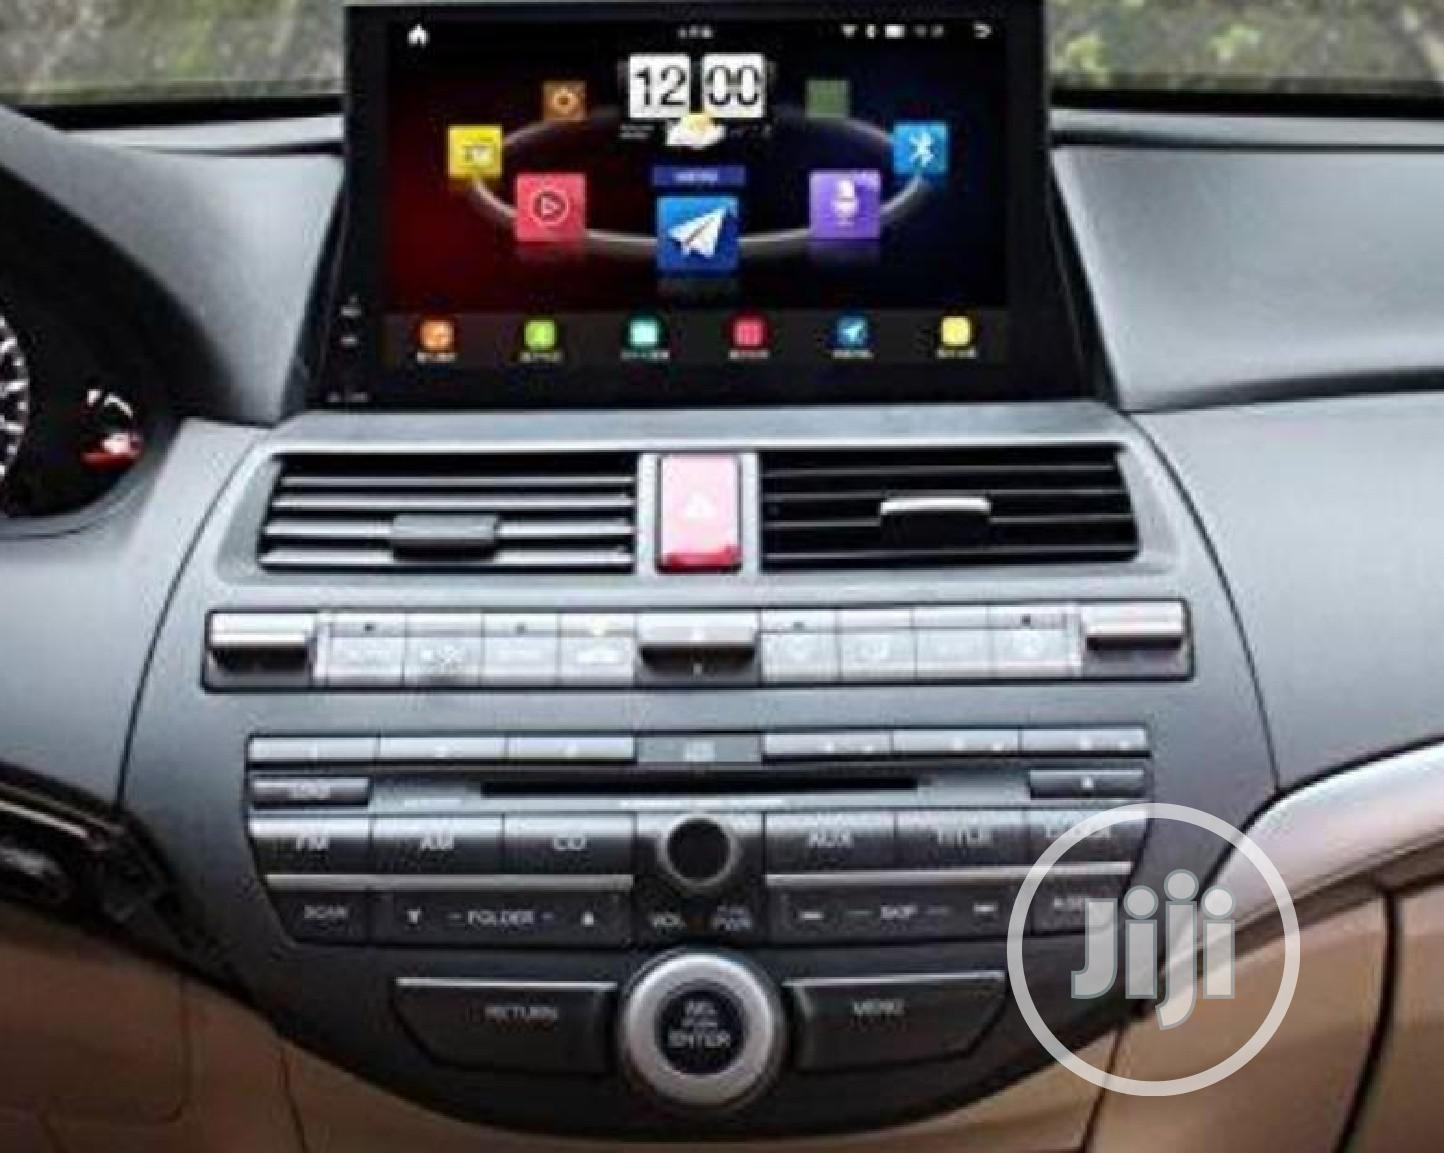 Archive: Honda Accord 2008-2013 Android GPS